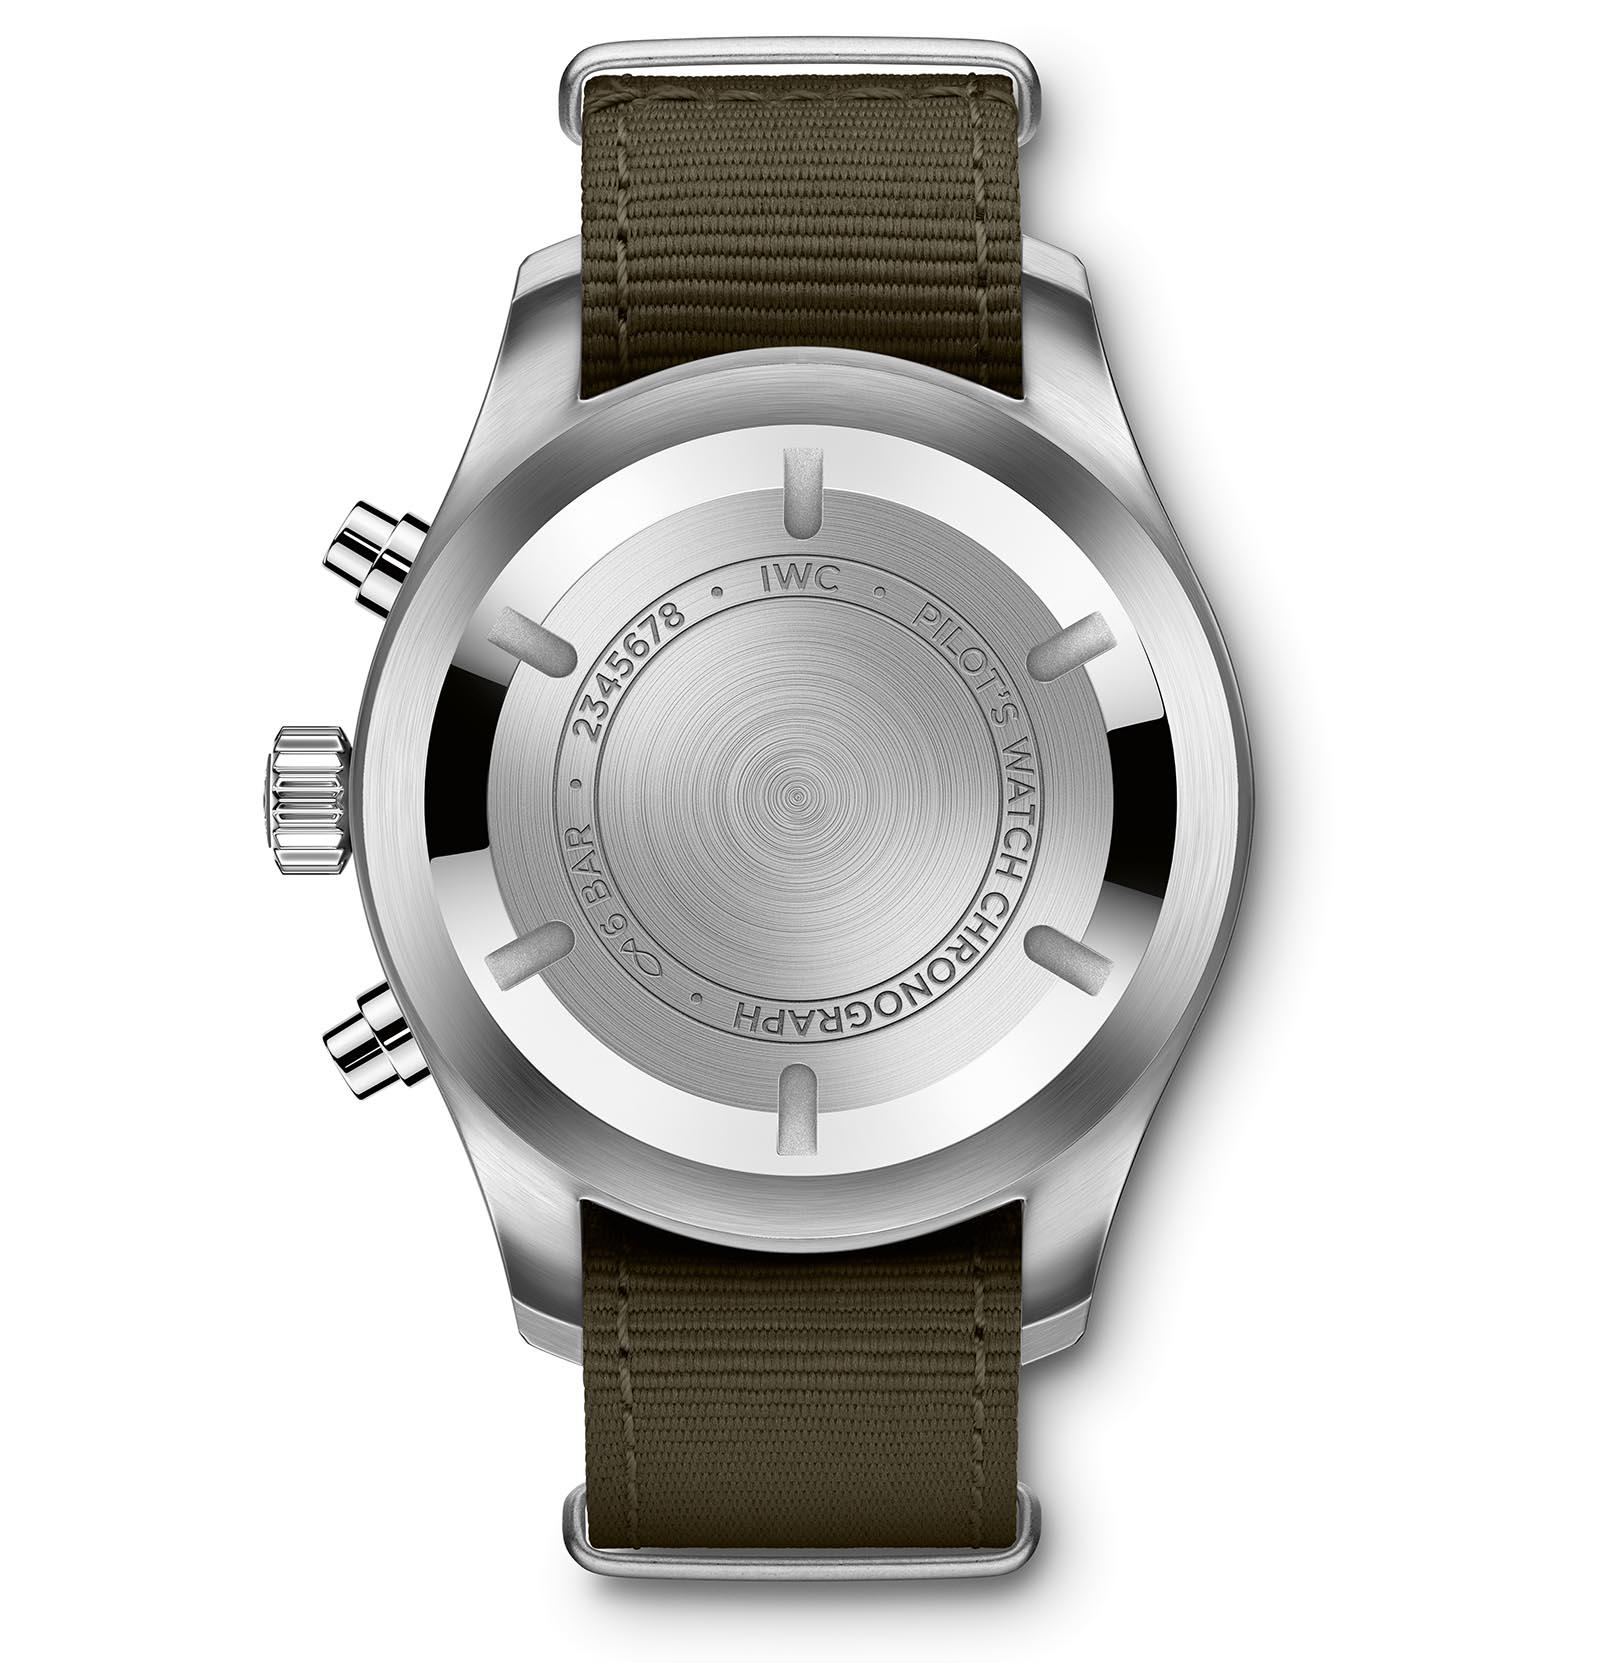 iwc-Pilot's Chronograph-377724 back